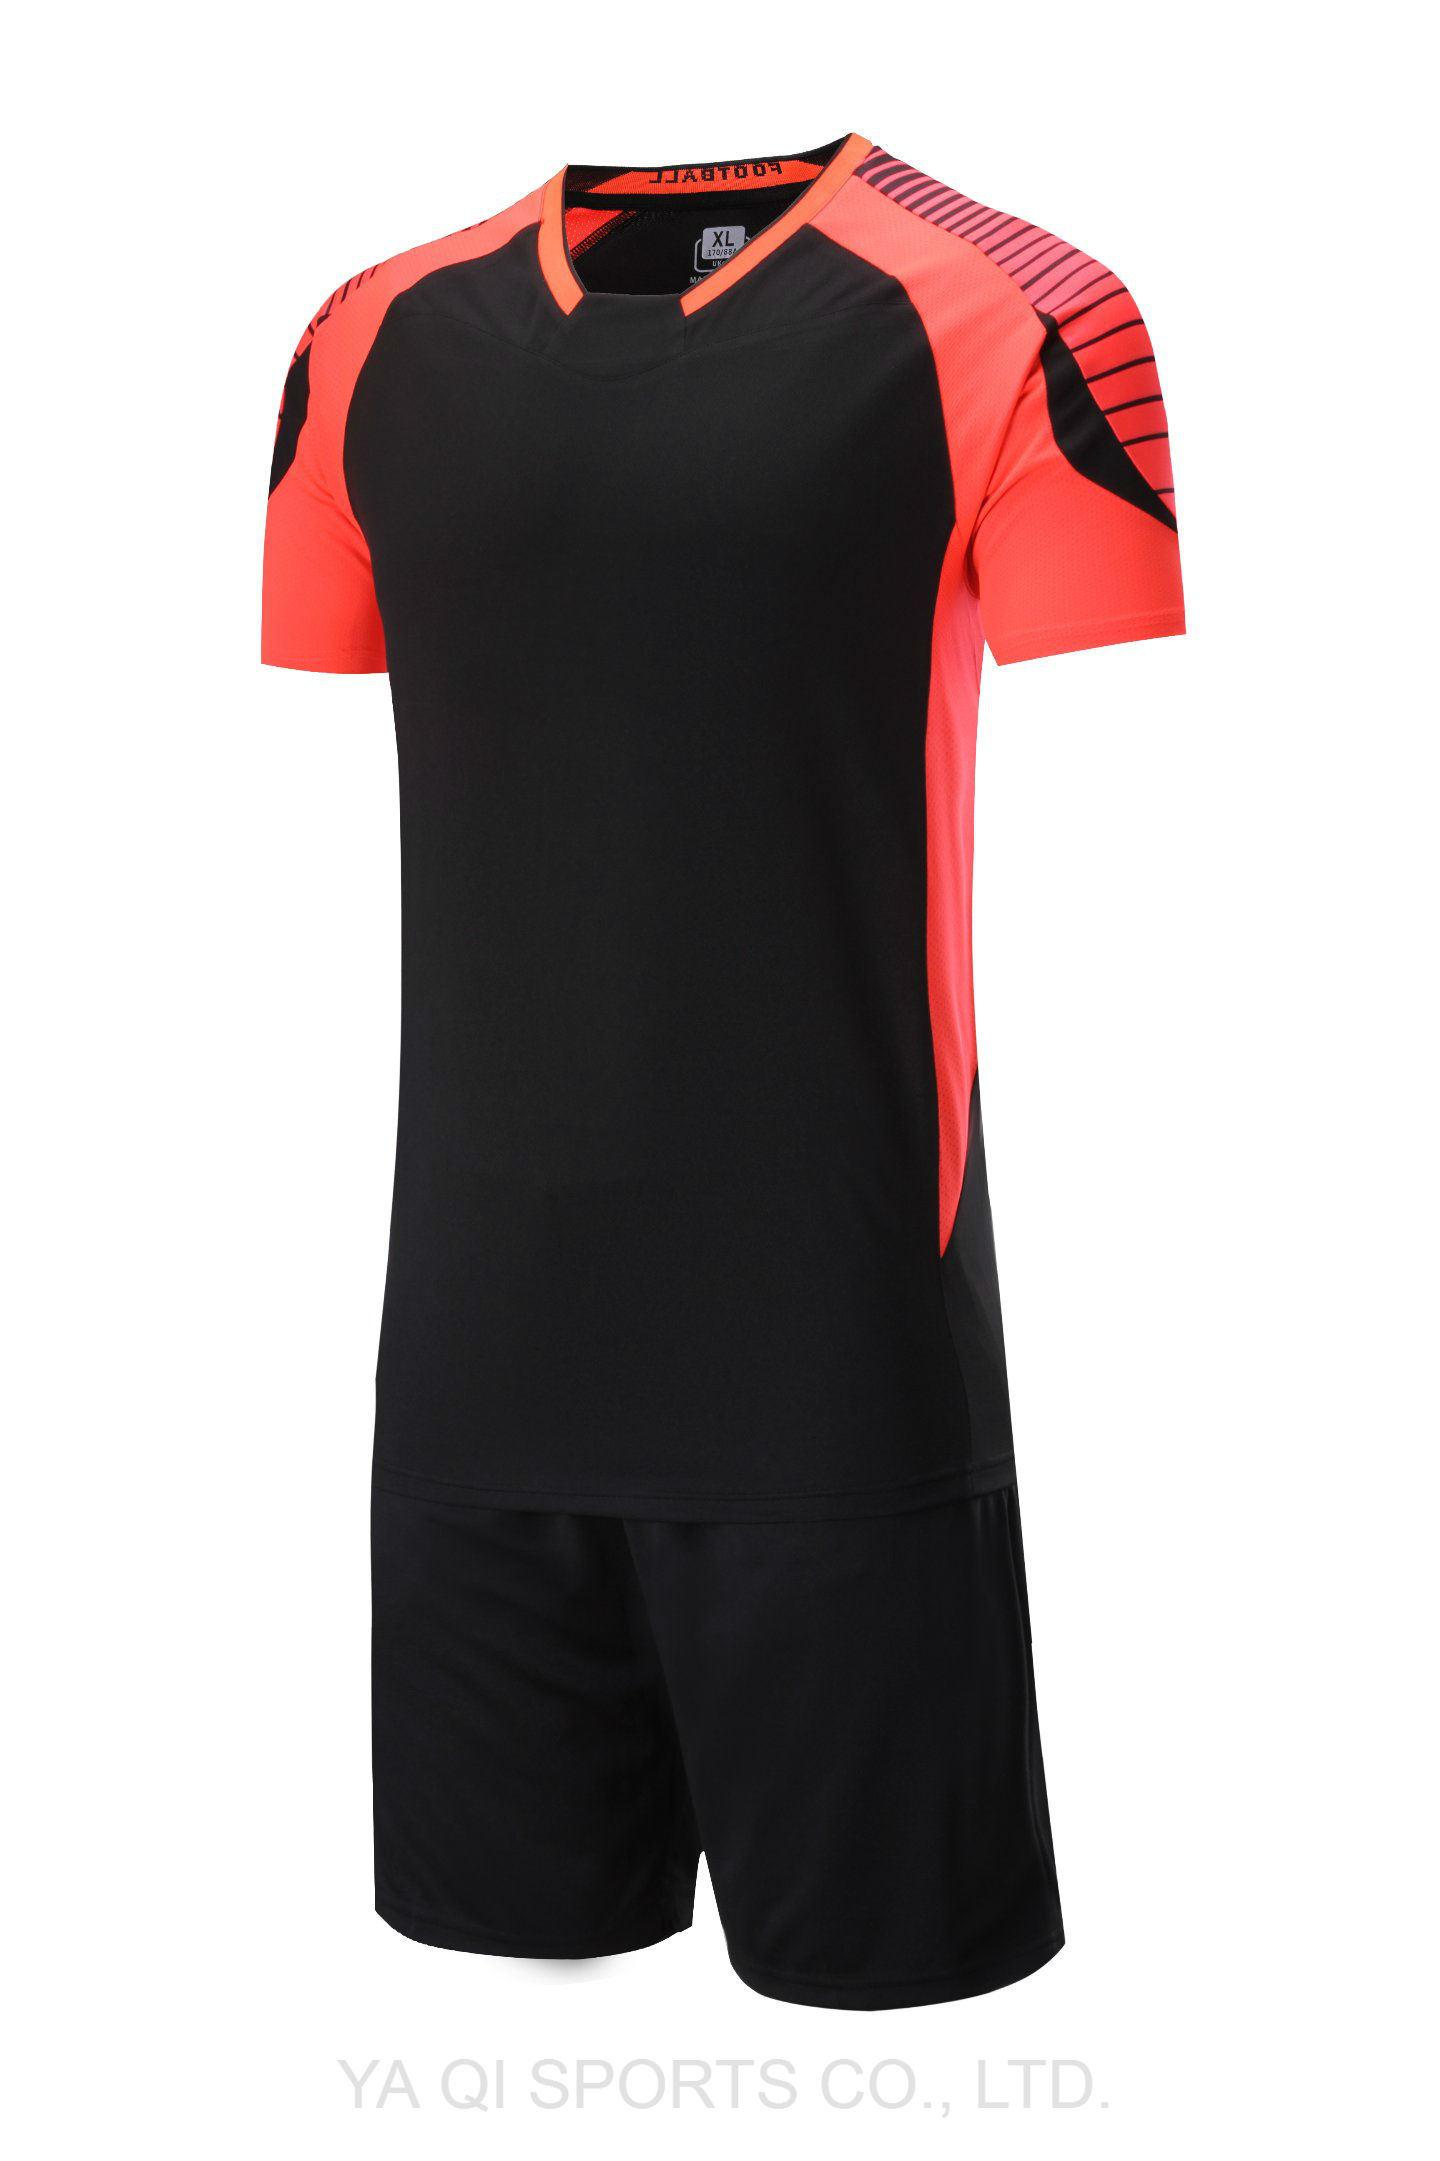 de4dc0f47 Promotional Blank Football Jersey Cheap Team Soccer Kits Wholesale Jersey  Soccer